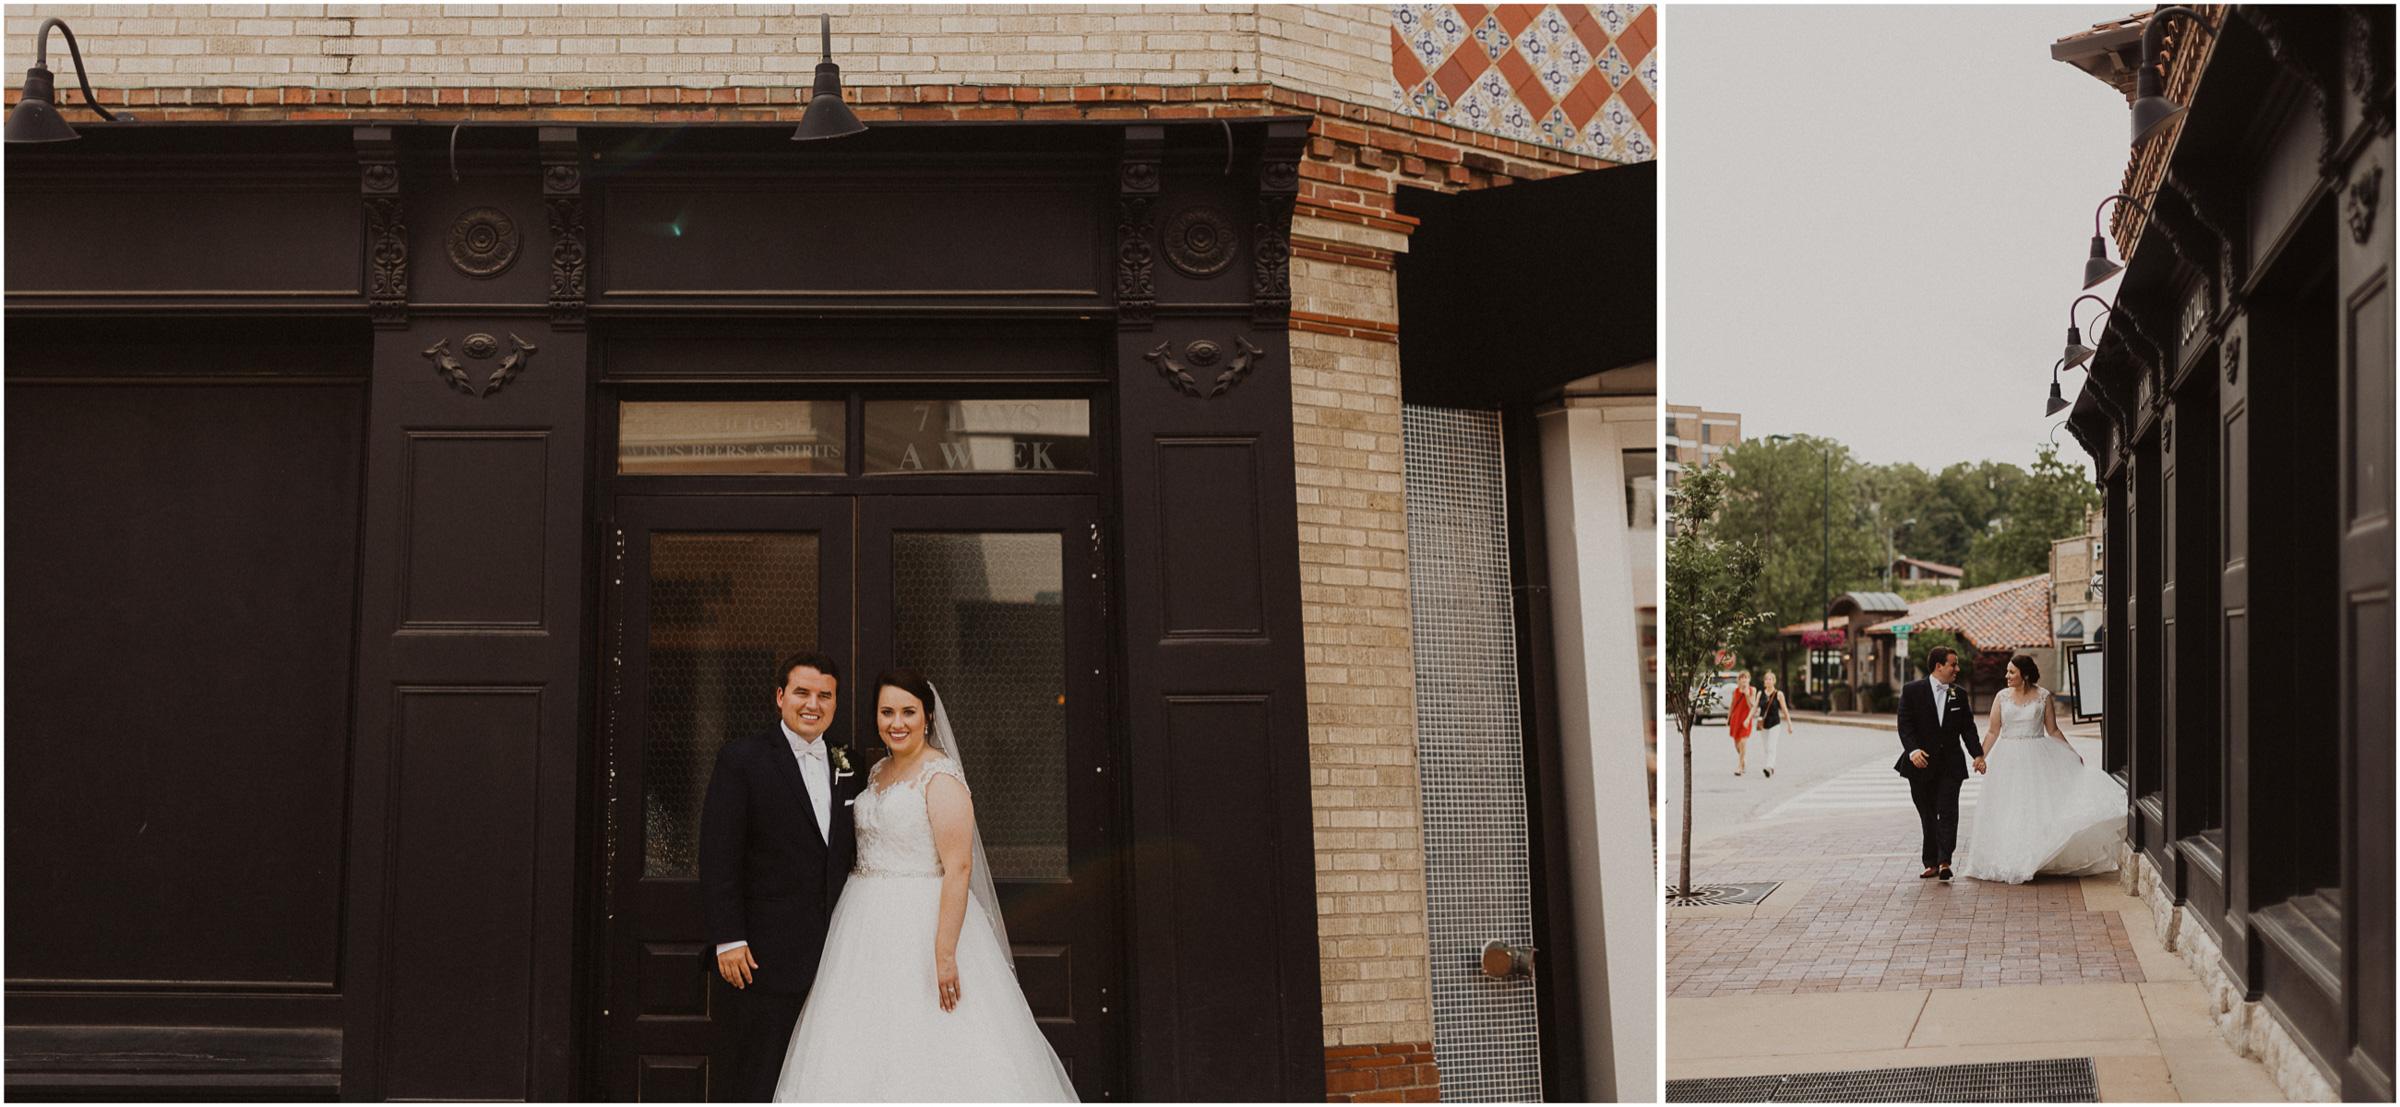 alyssa barletter photography classic kansas city wedding loose park plaza country club summer wedding-41.jpg